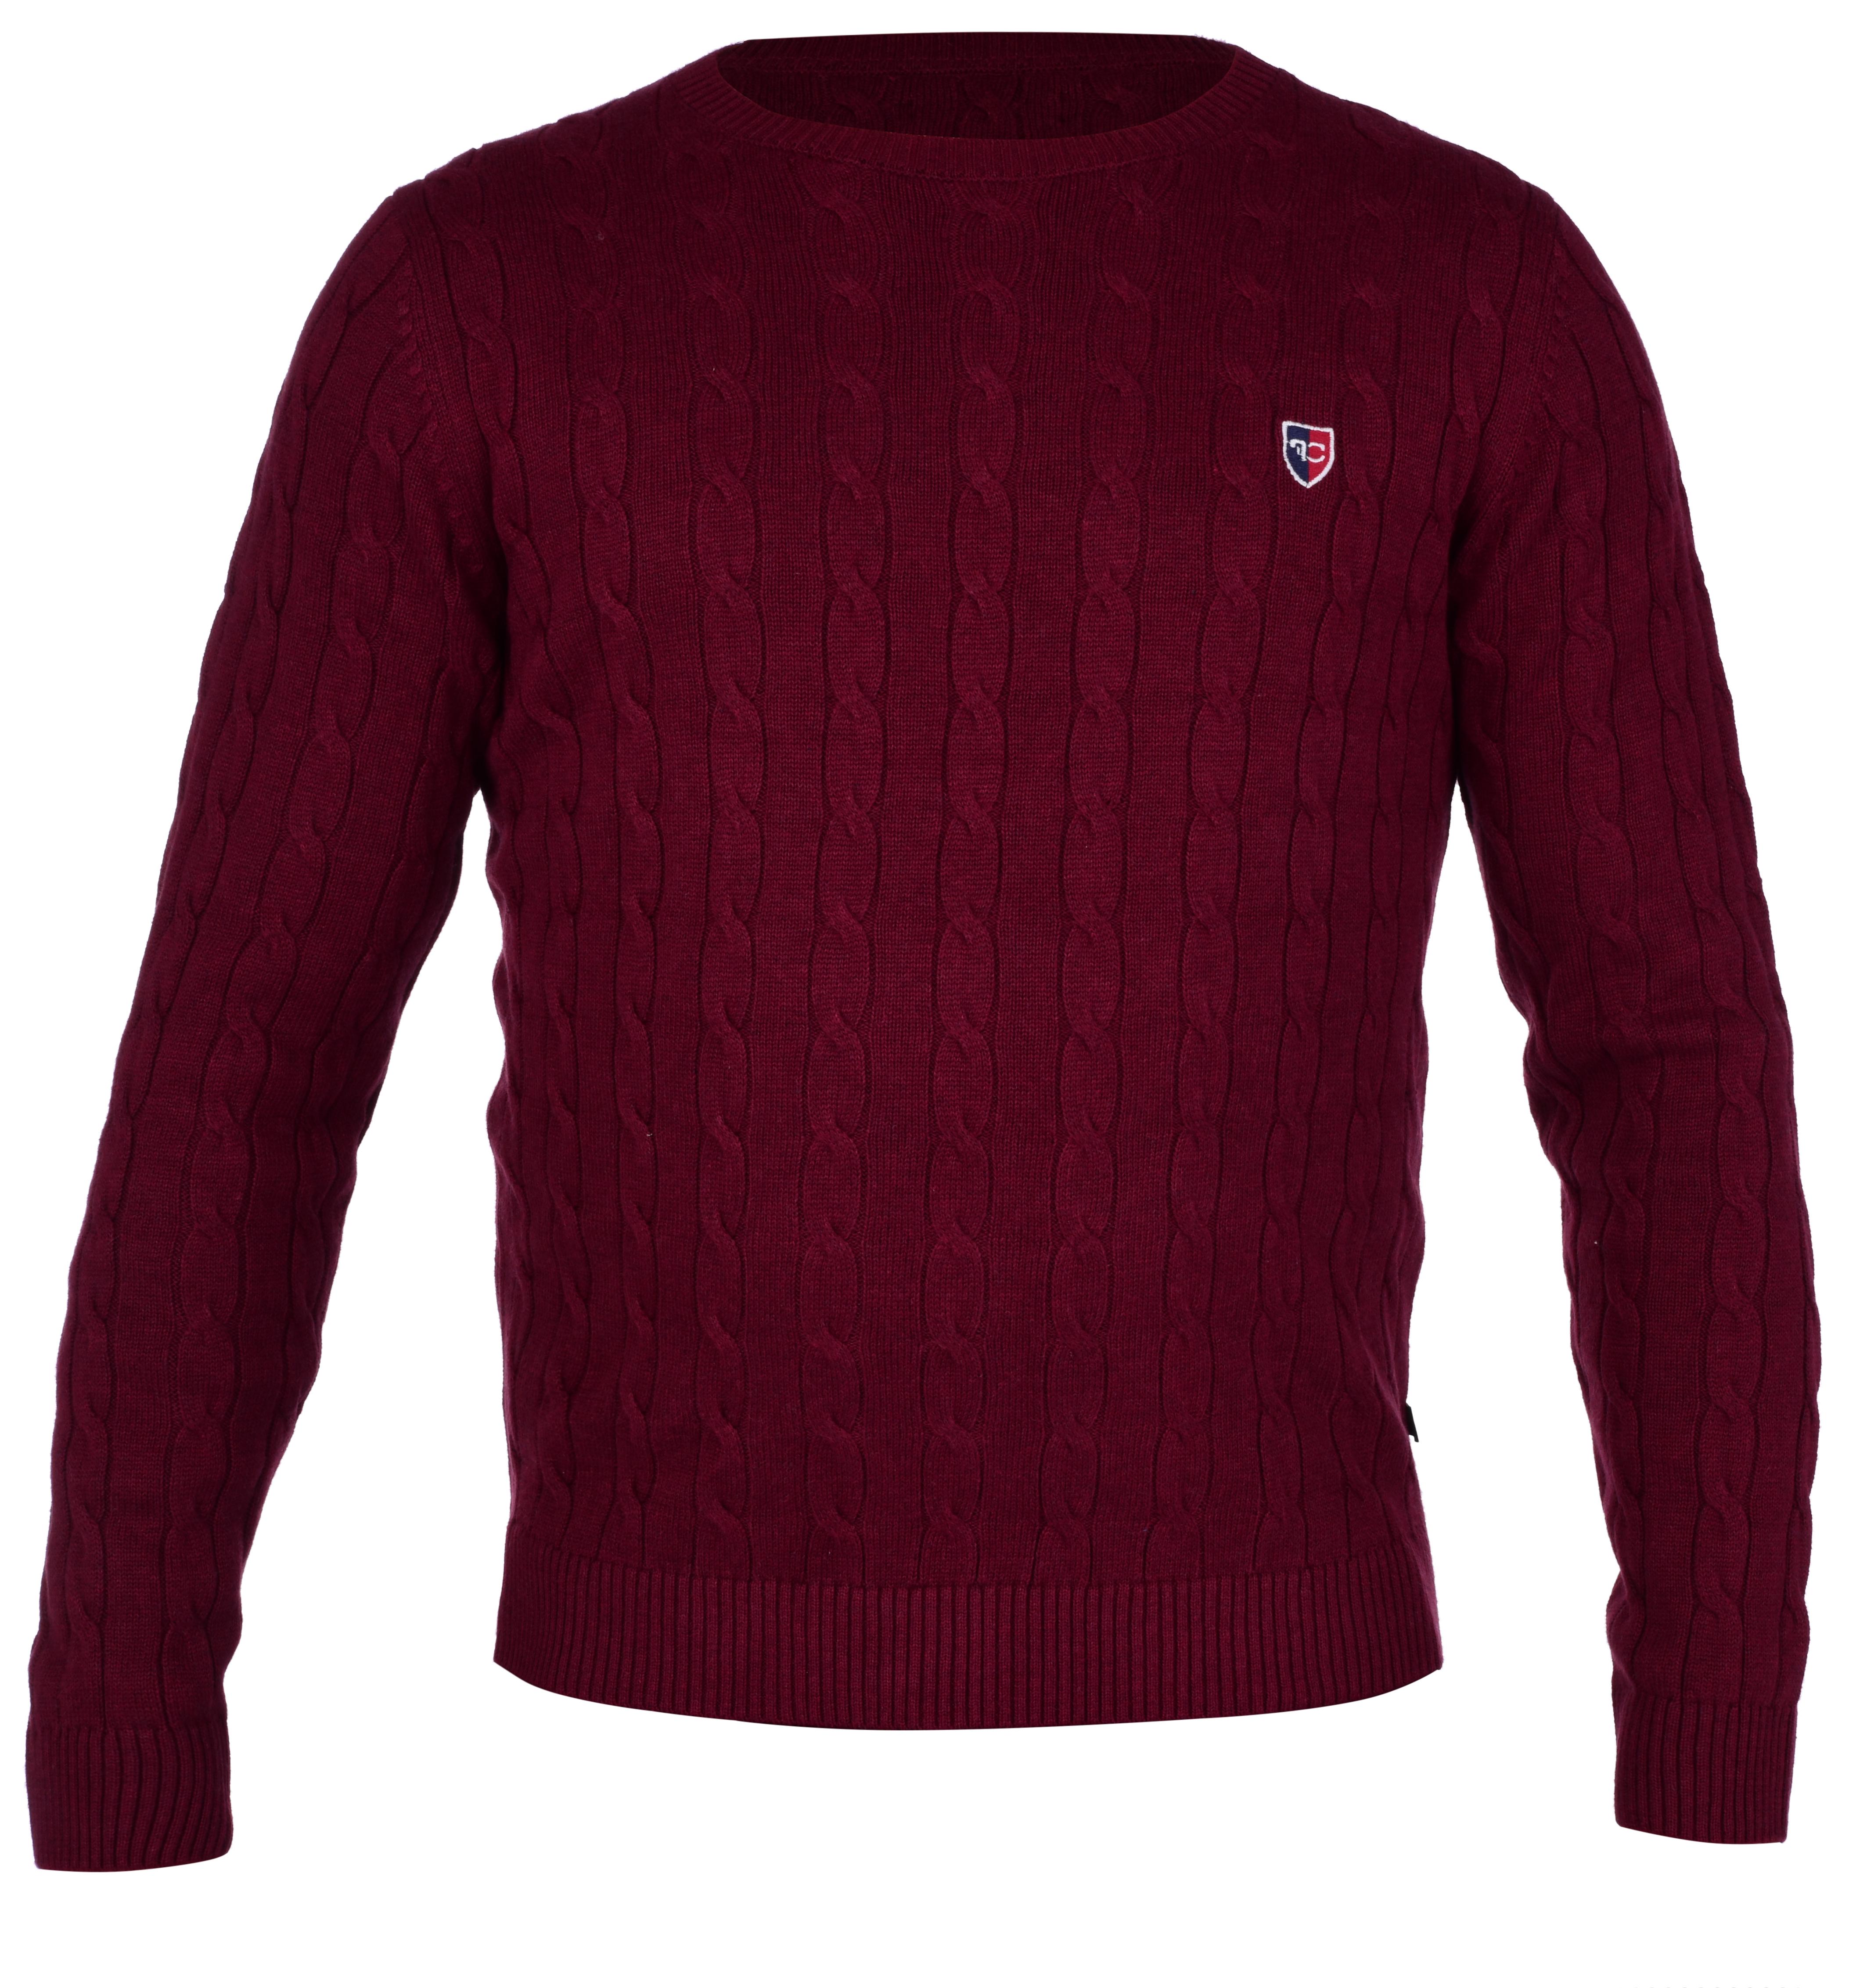 COTTON LÉGER pánský svetr bordó melange 1(M)